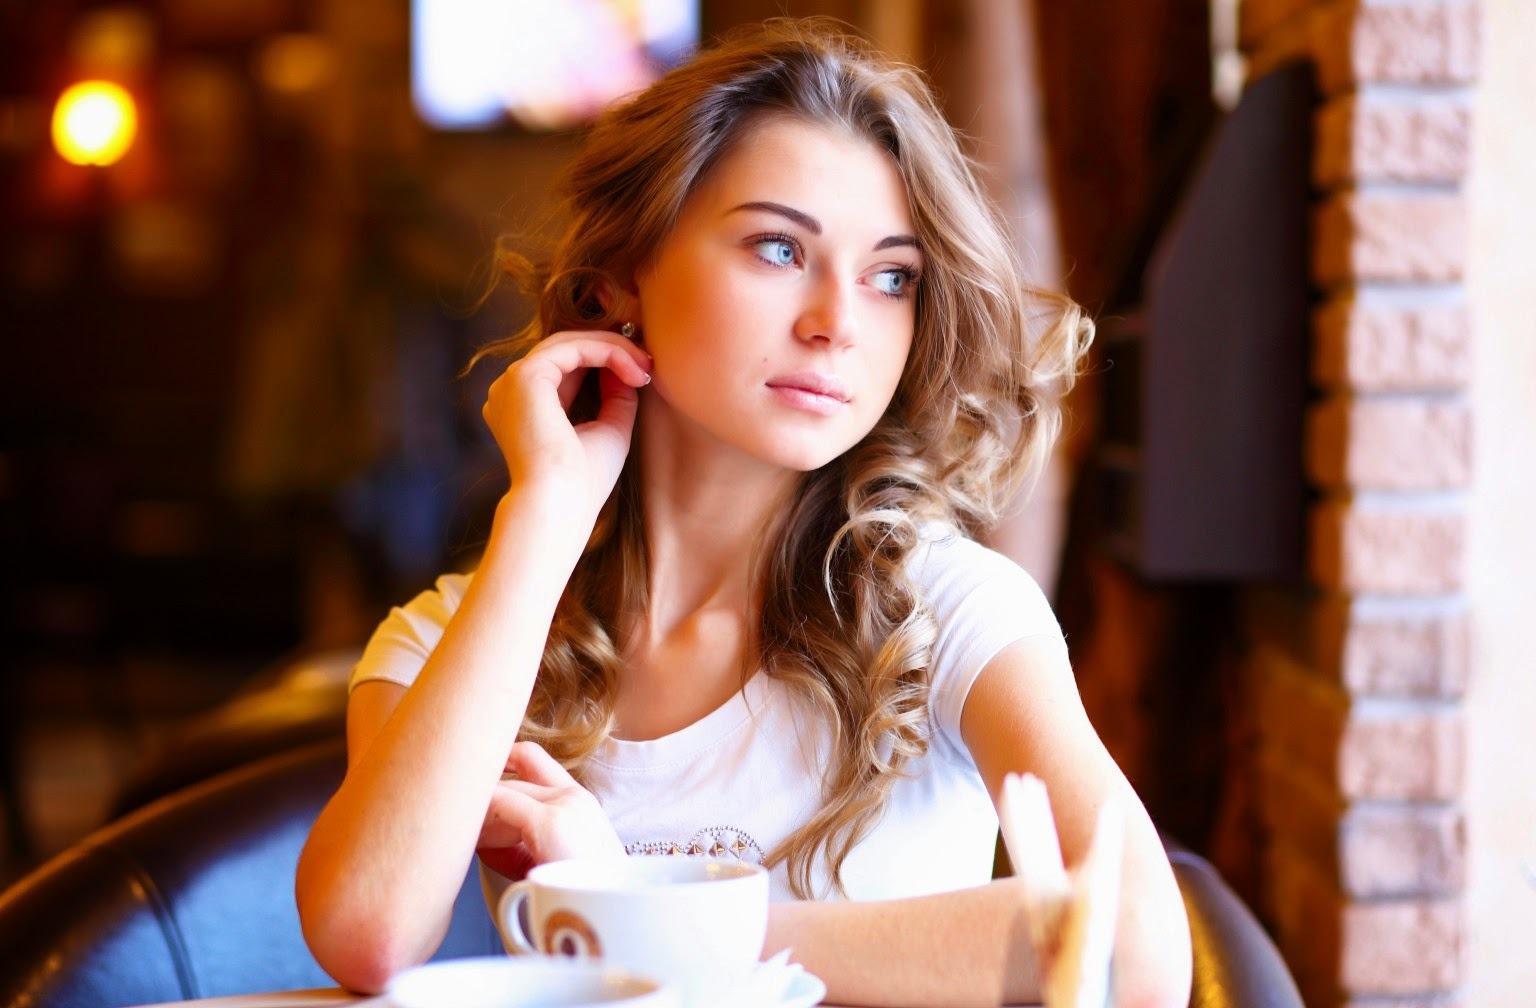 How to meet a good christian woman